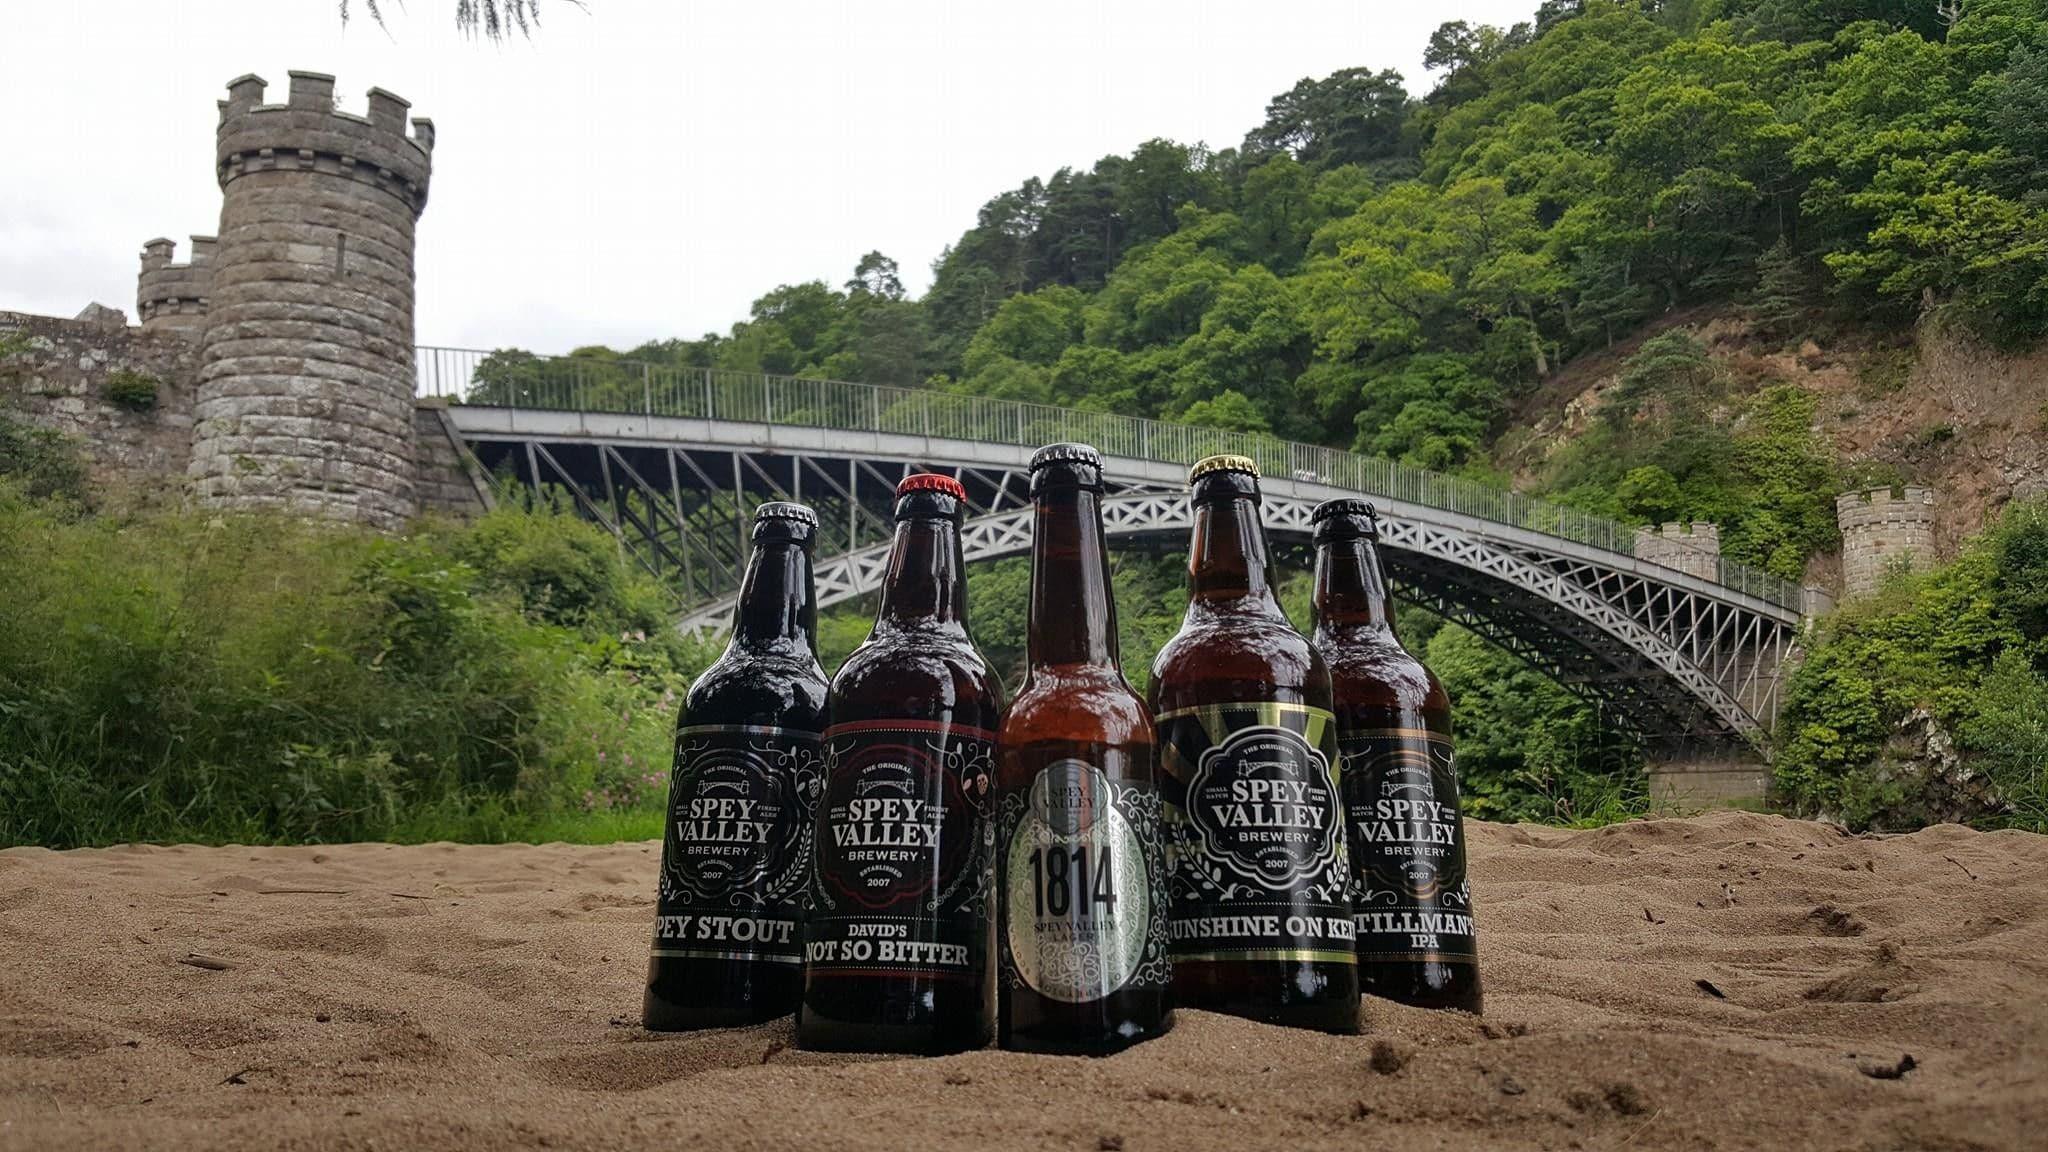 Spey Valley Brewery